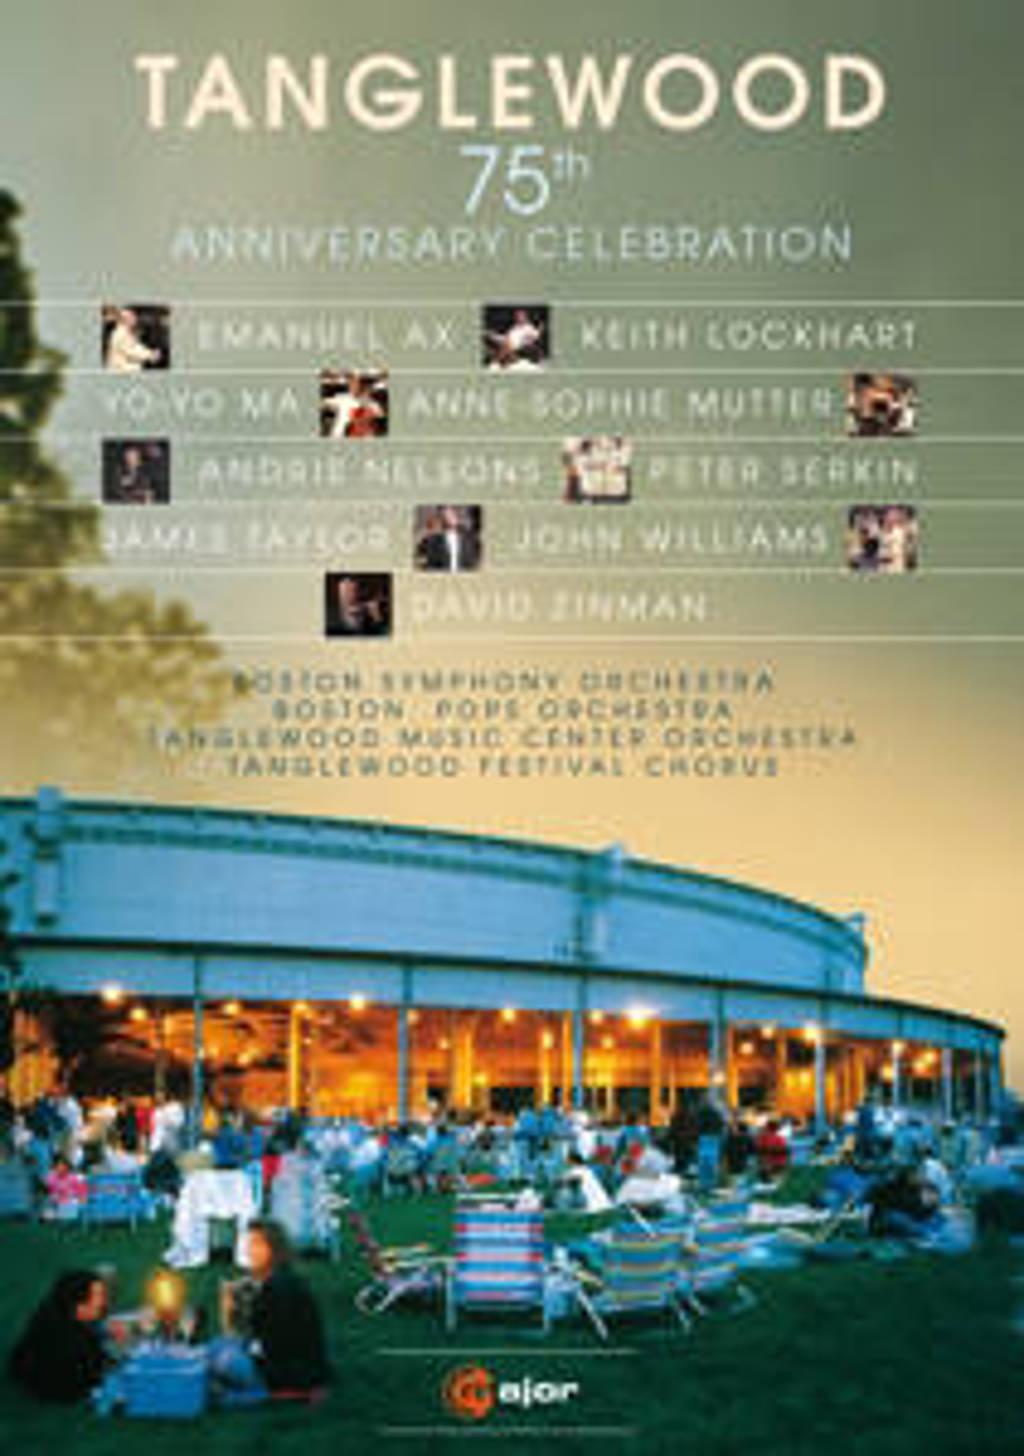 Yo-Yo Ma,Mutter, Taylor - Tanglewood 75th Anniversary (DVD)